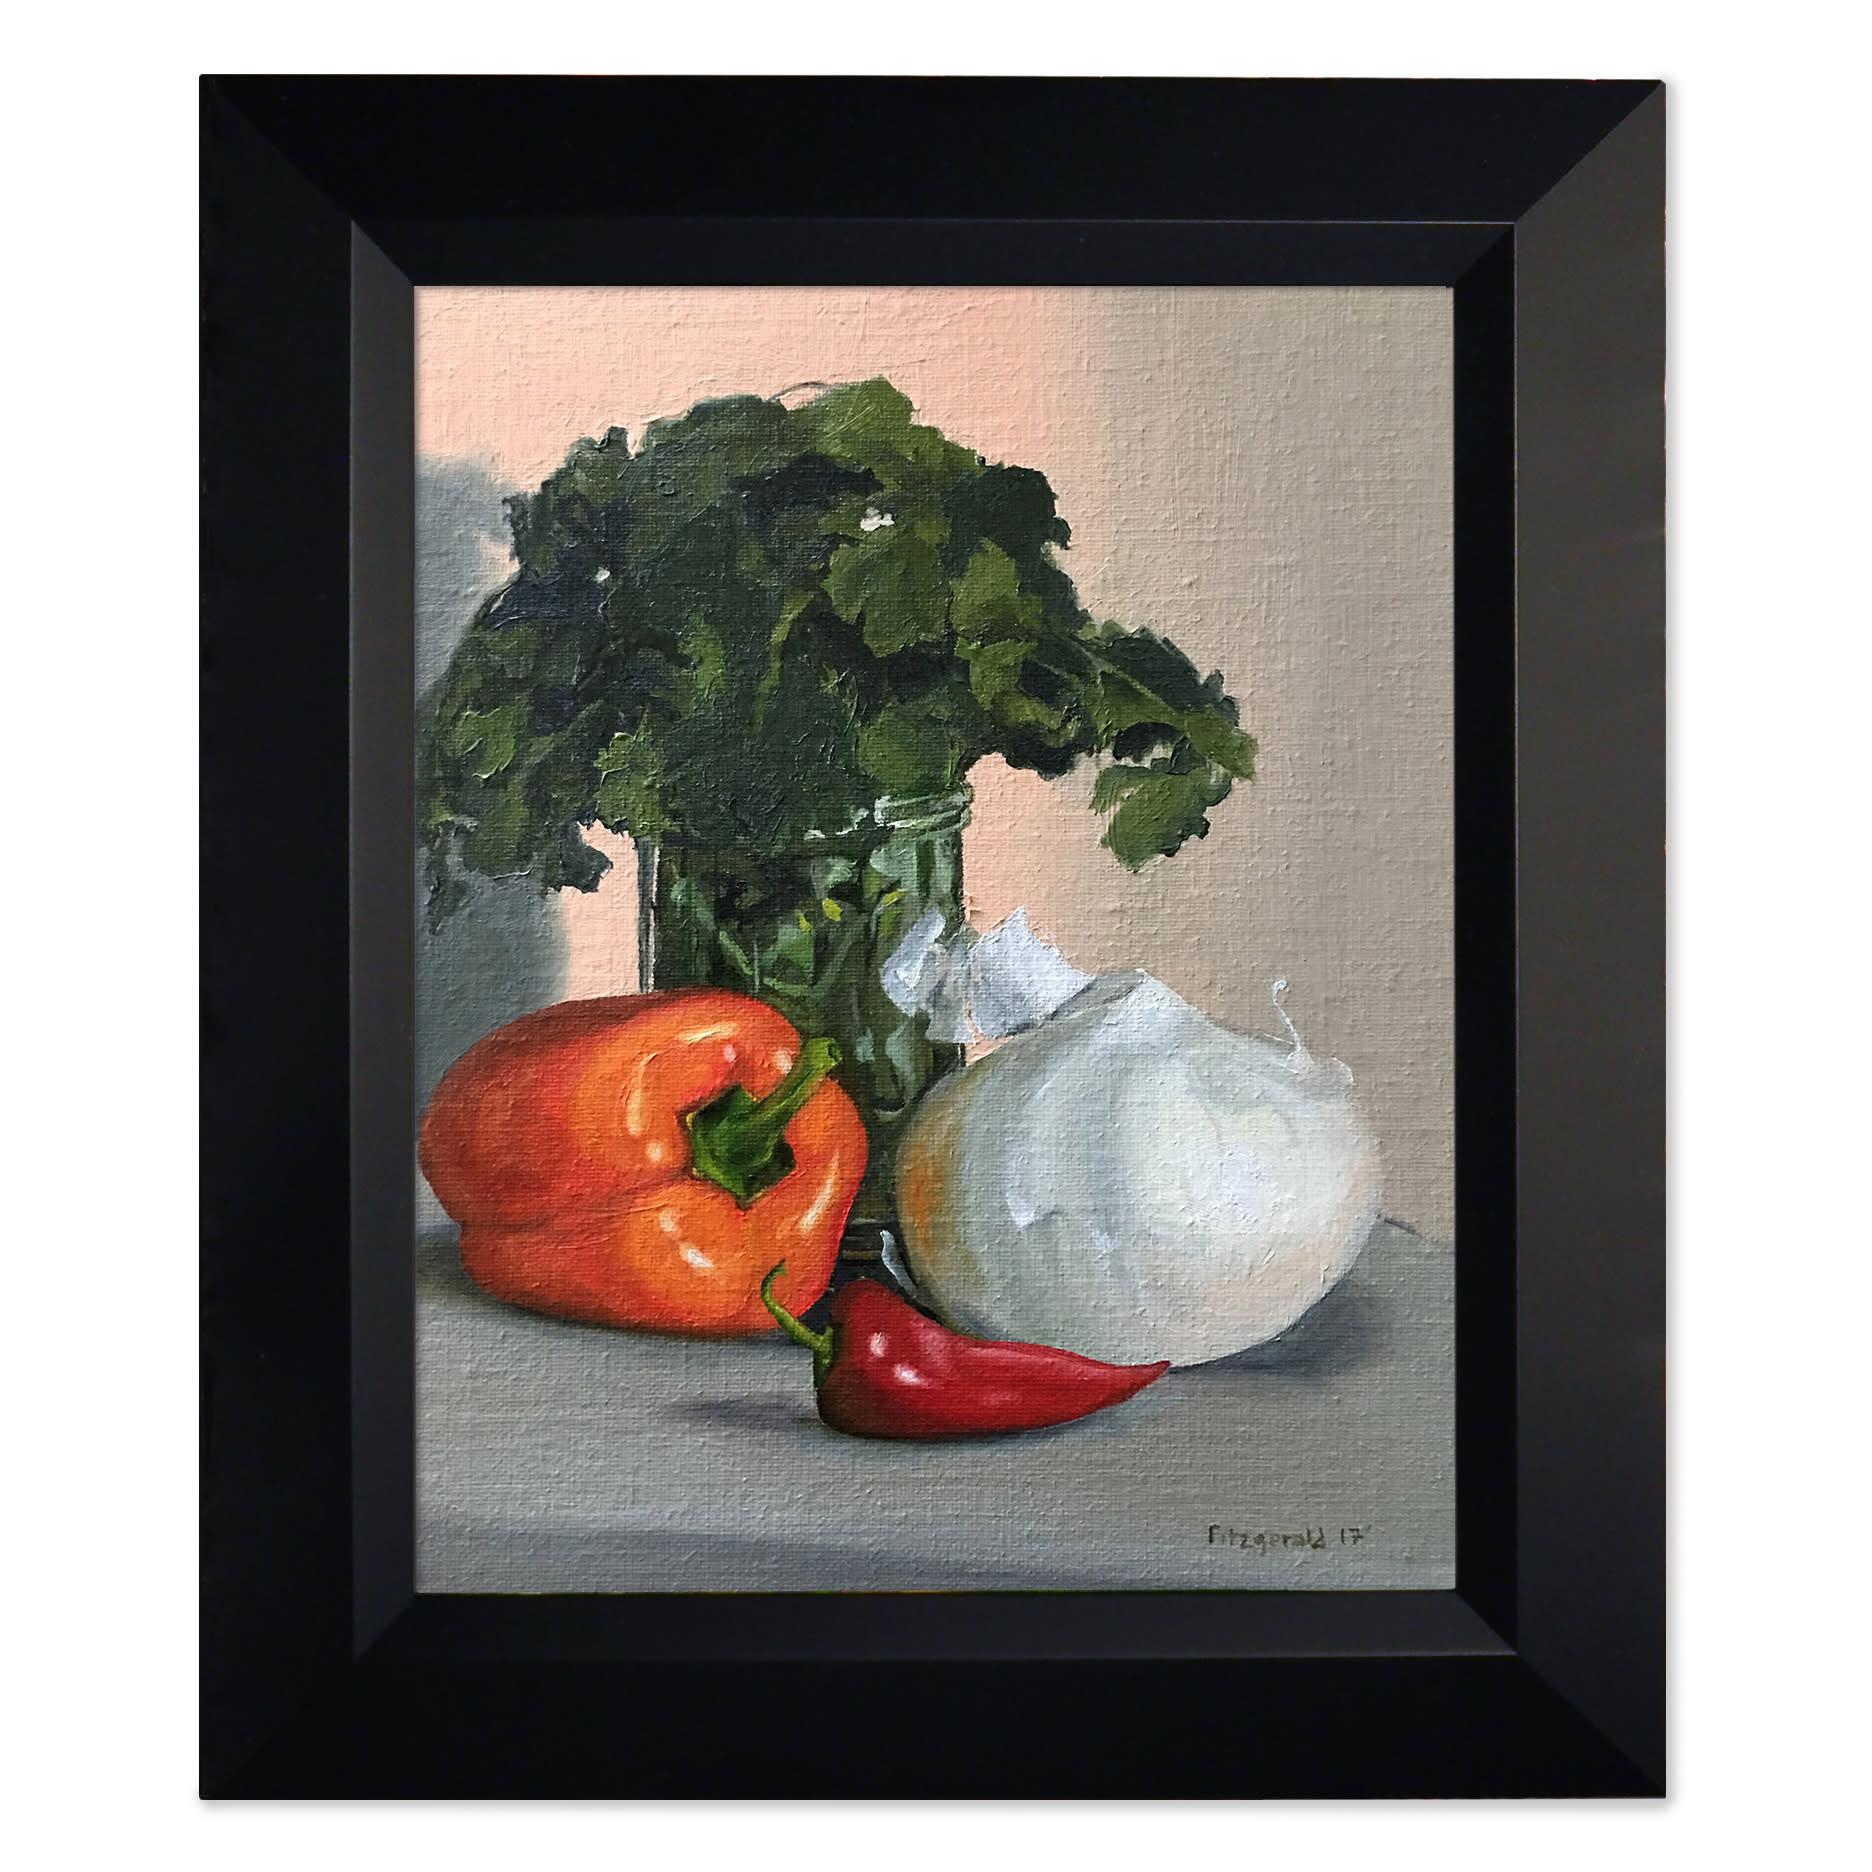 Abbey fitzgerald salsa painting frame cxjsqh